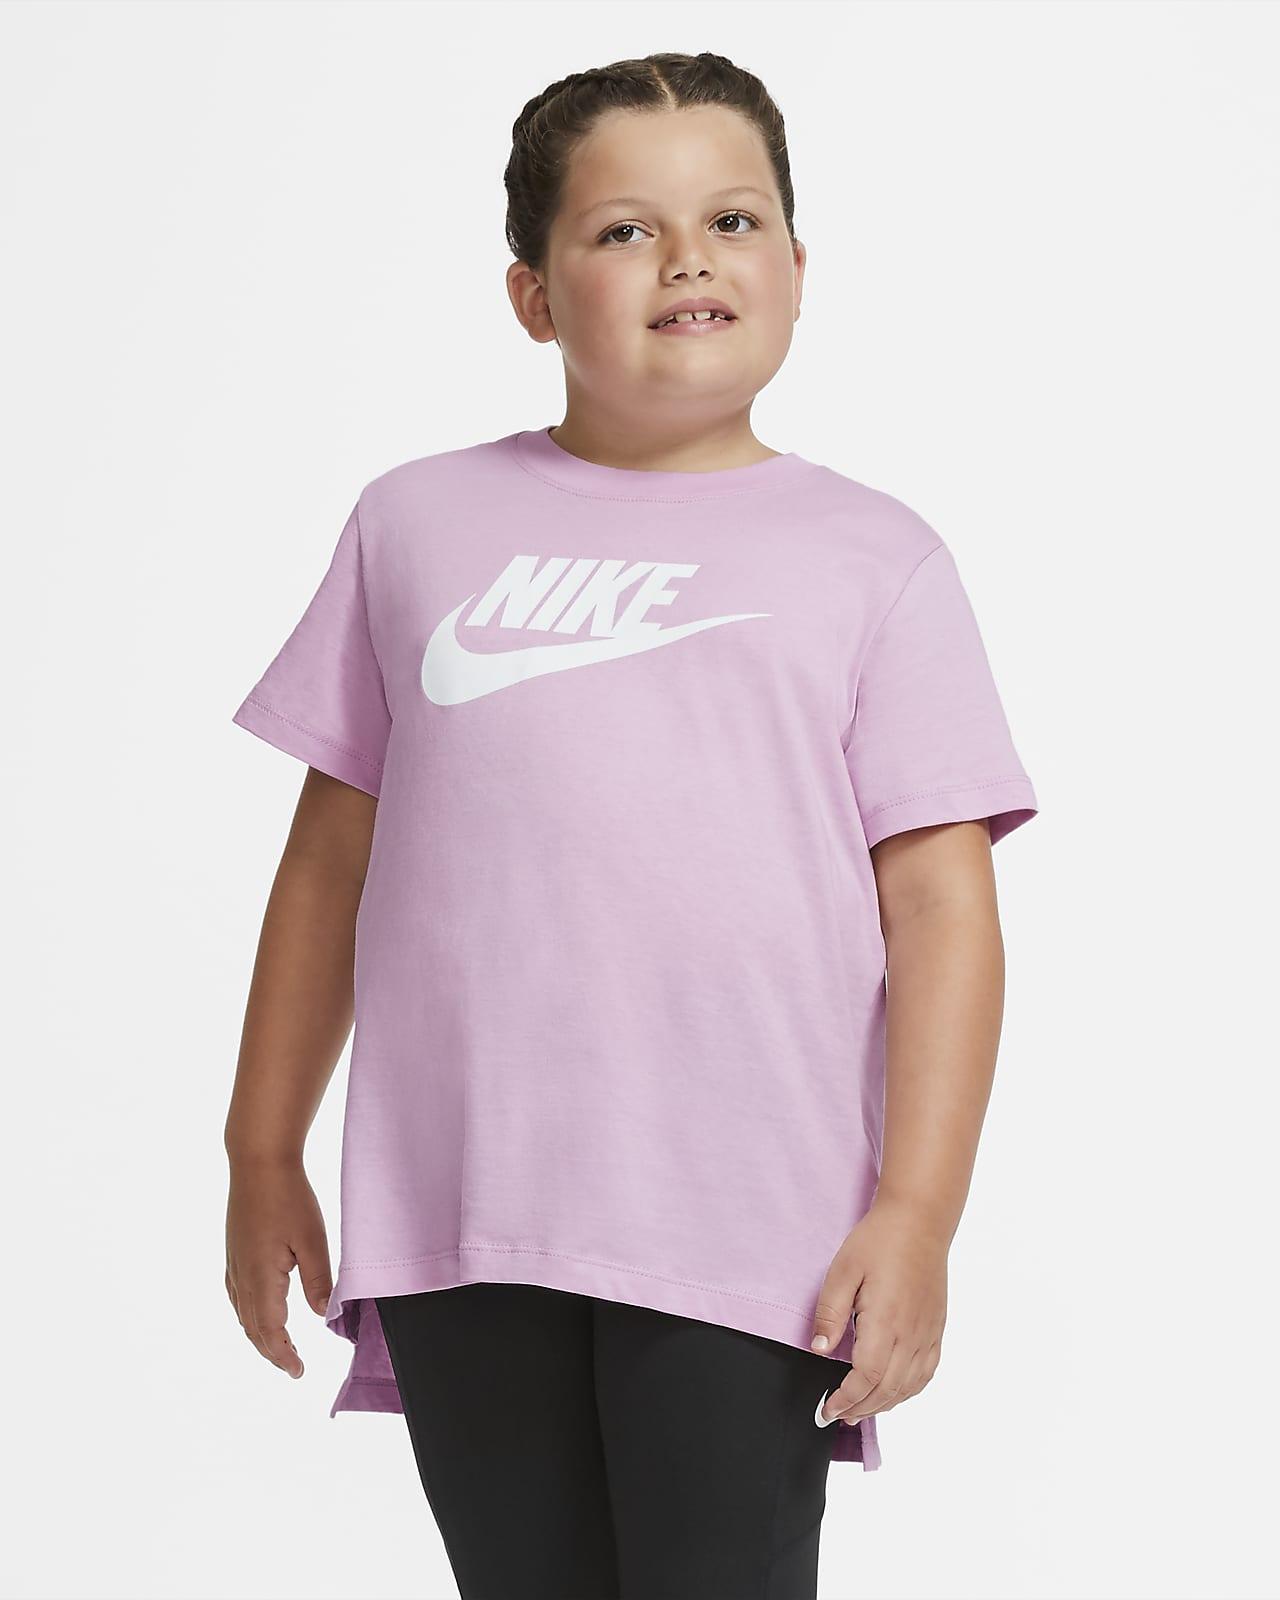 Nike Camiseta (Talla grande) - Niña